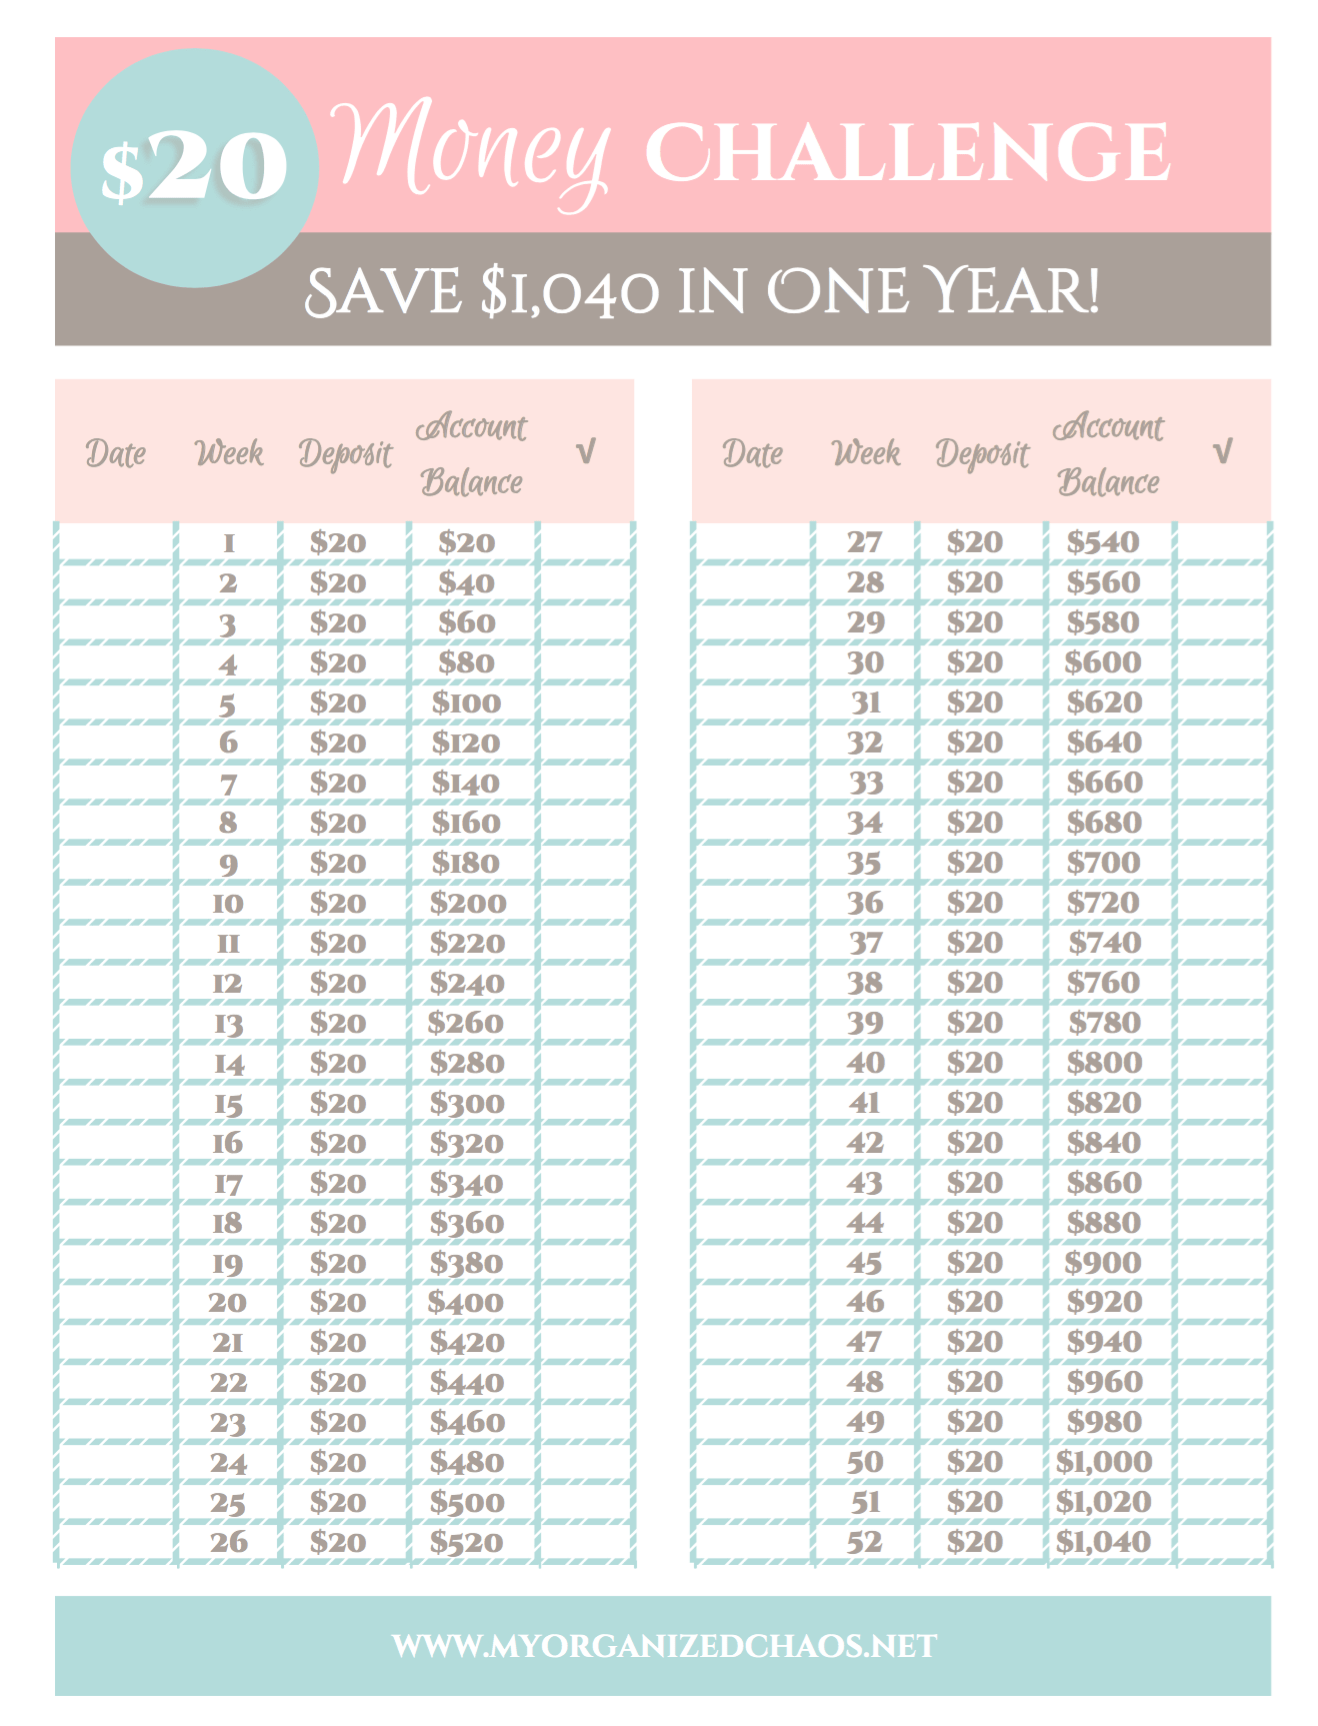 2 Easy Money Savings Challenges